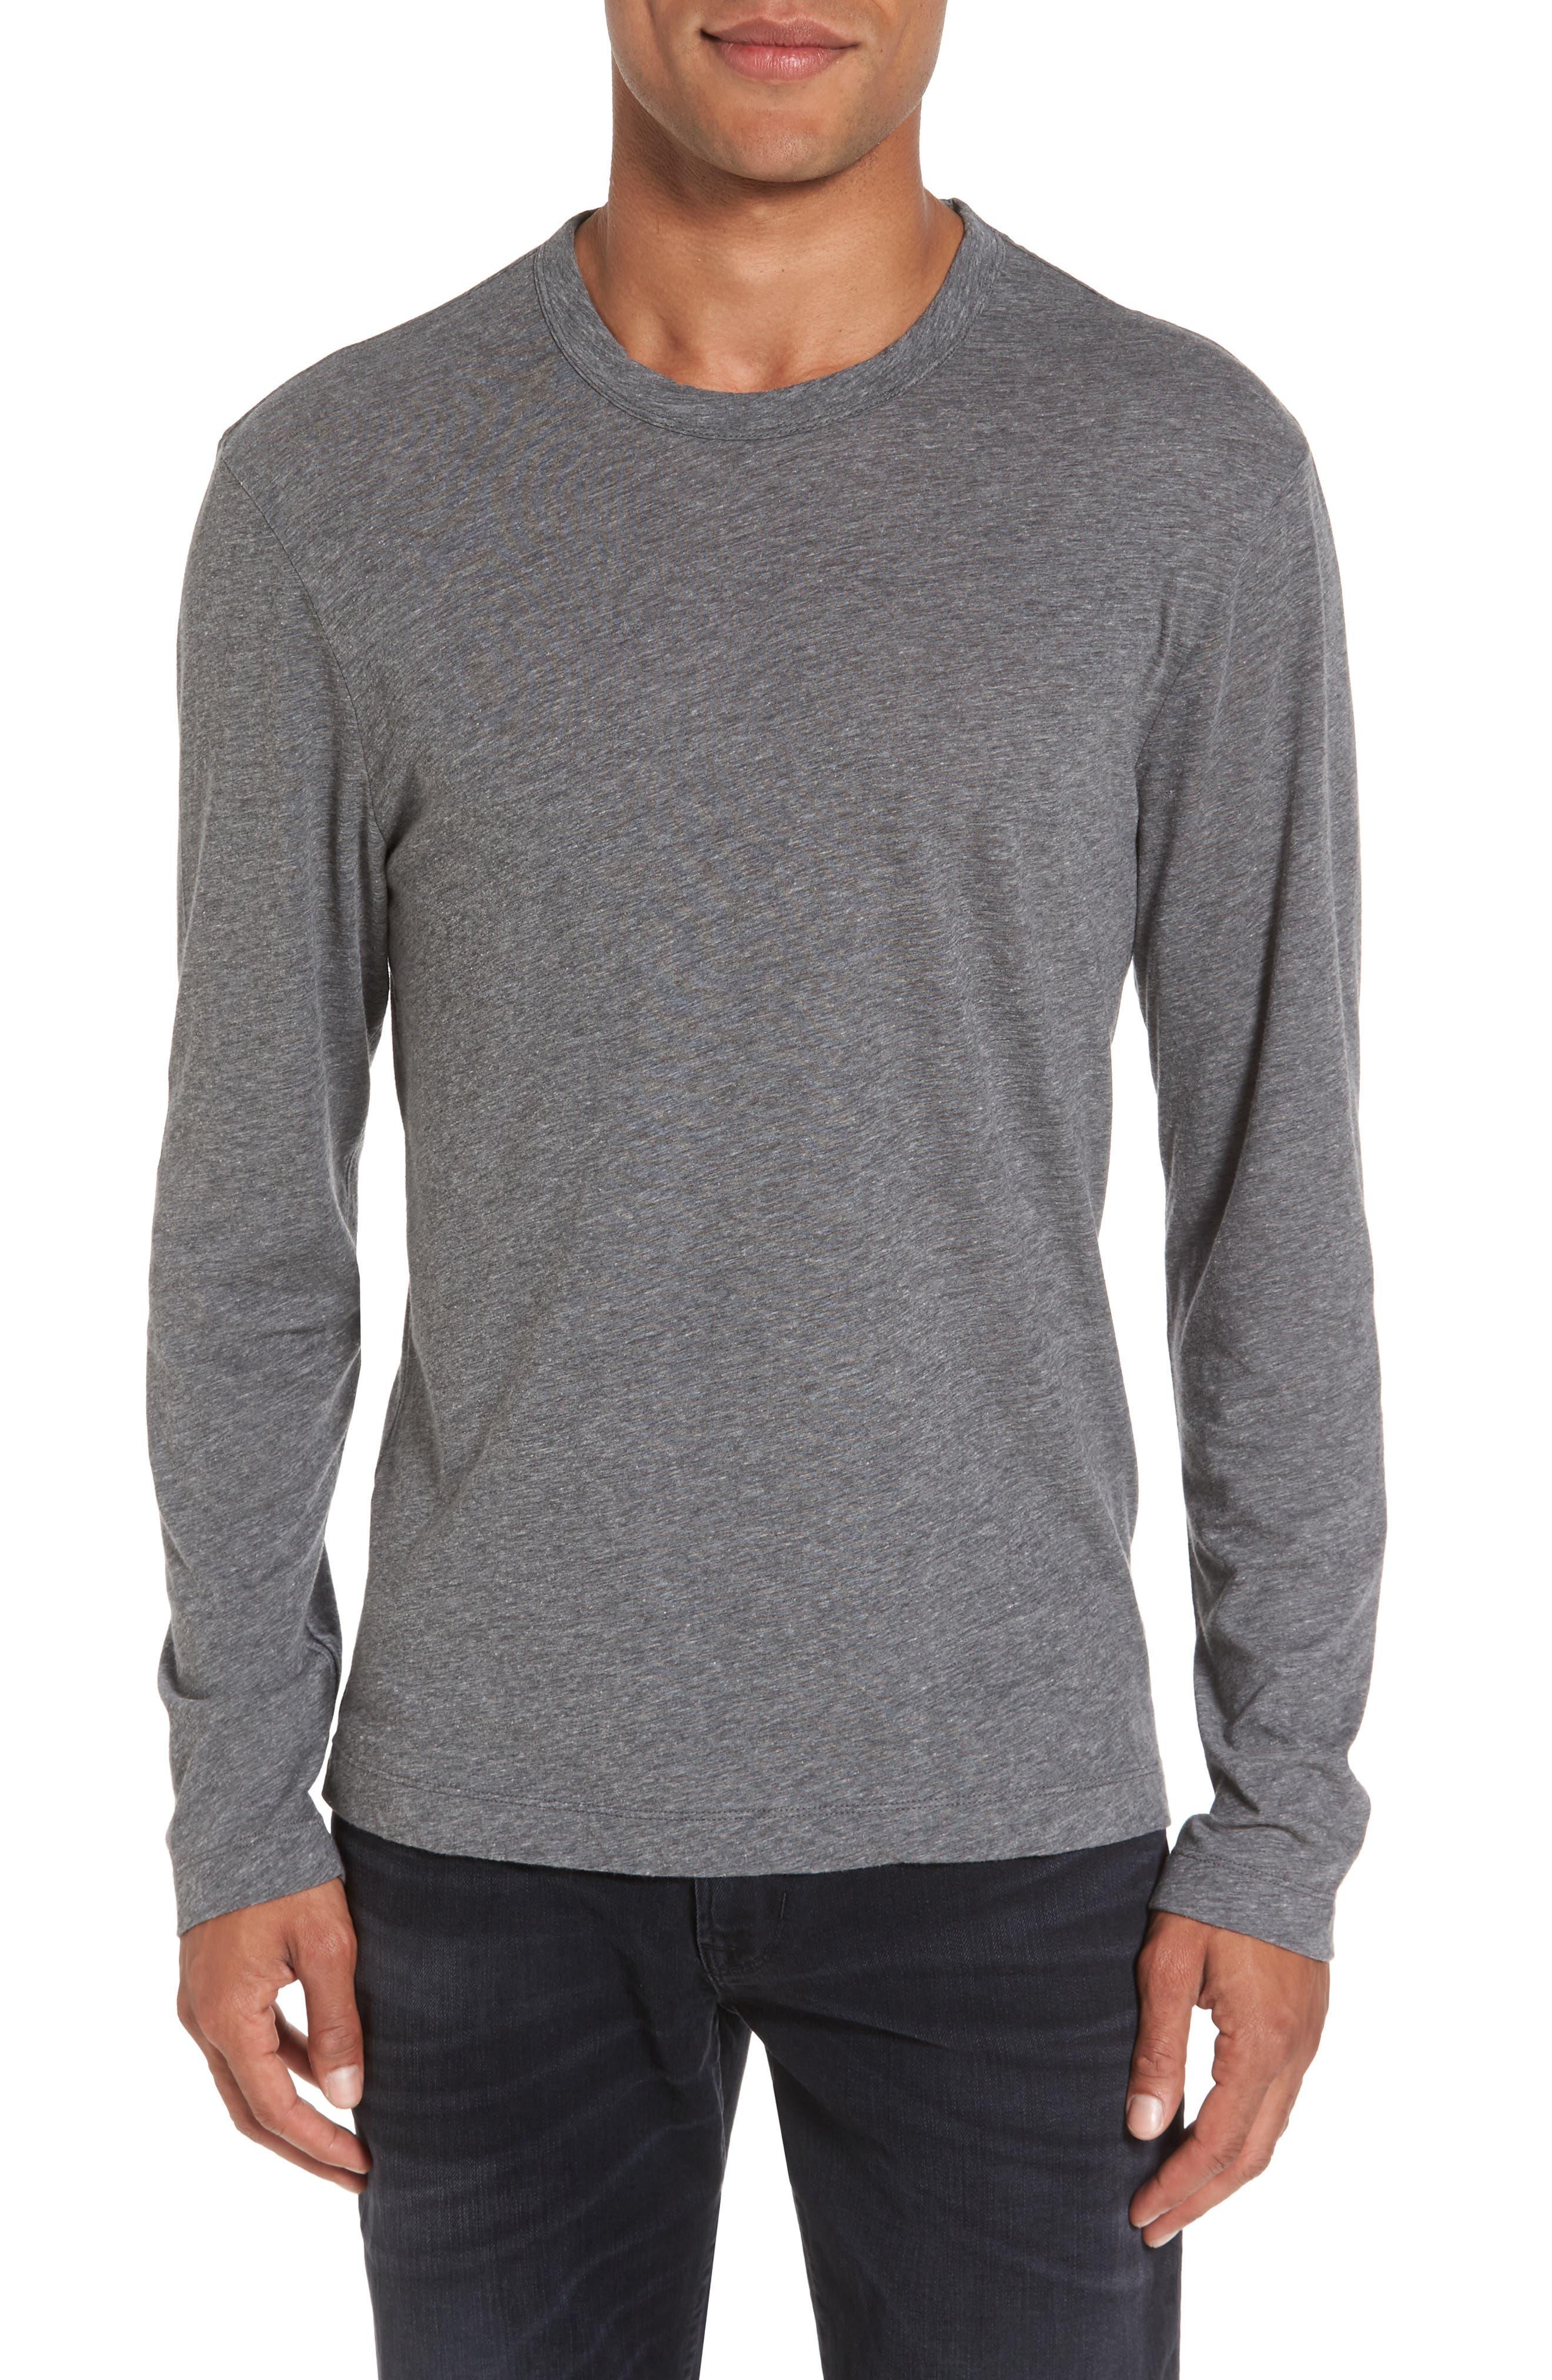 Main Image - James Perse Mélange Knit Long Sleeve T-Shirt